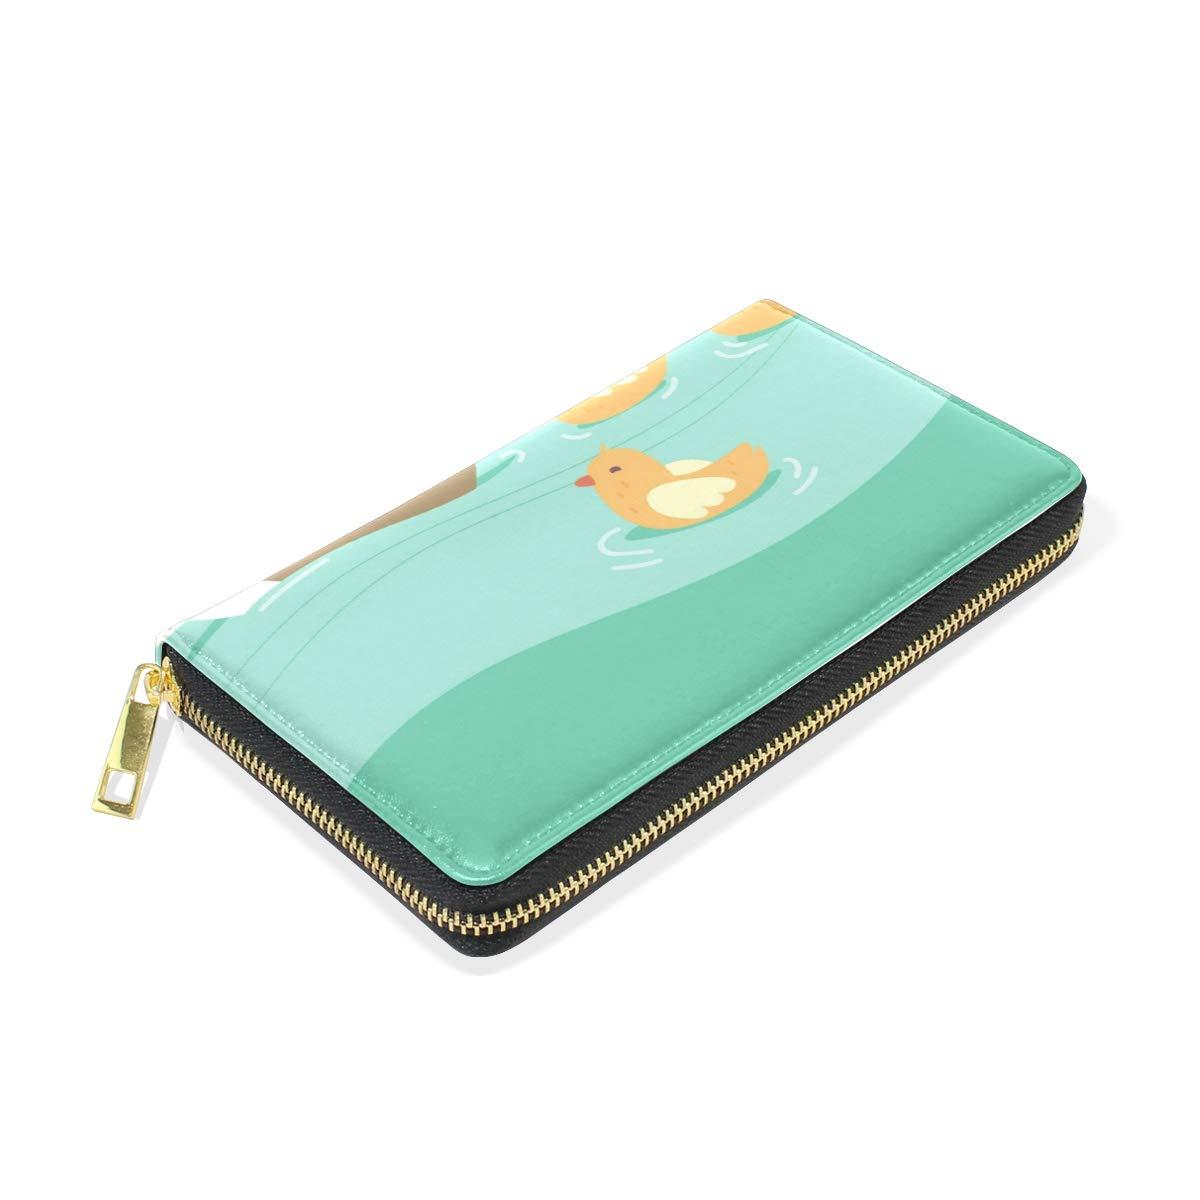 Women Wallet Coin Purse Phone Clutch Pouch Cash Bag,Duck Cute Female Girl Card Change Holder Organizer Storage Key Hold Elegant Handbag Gift